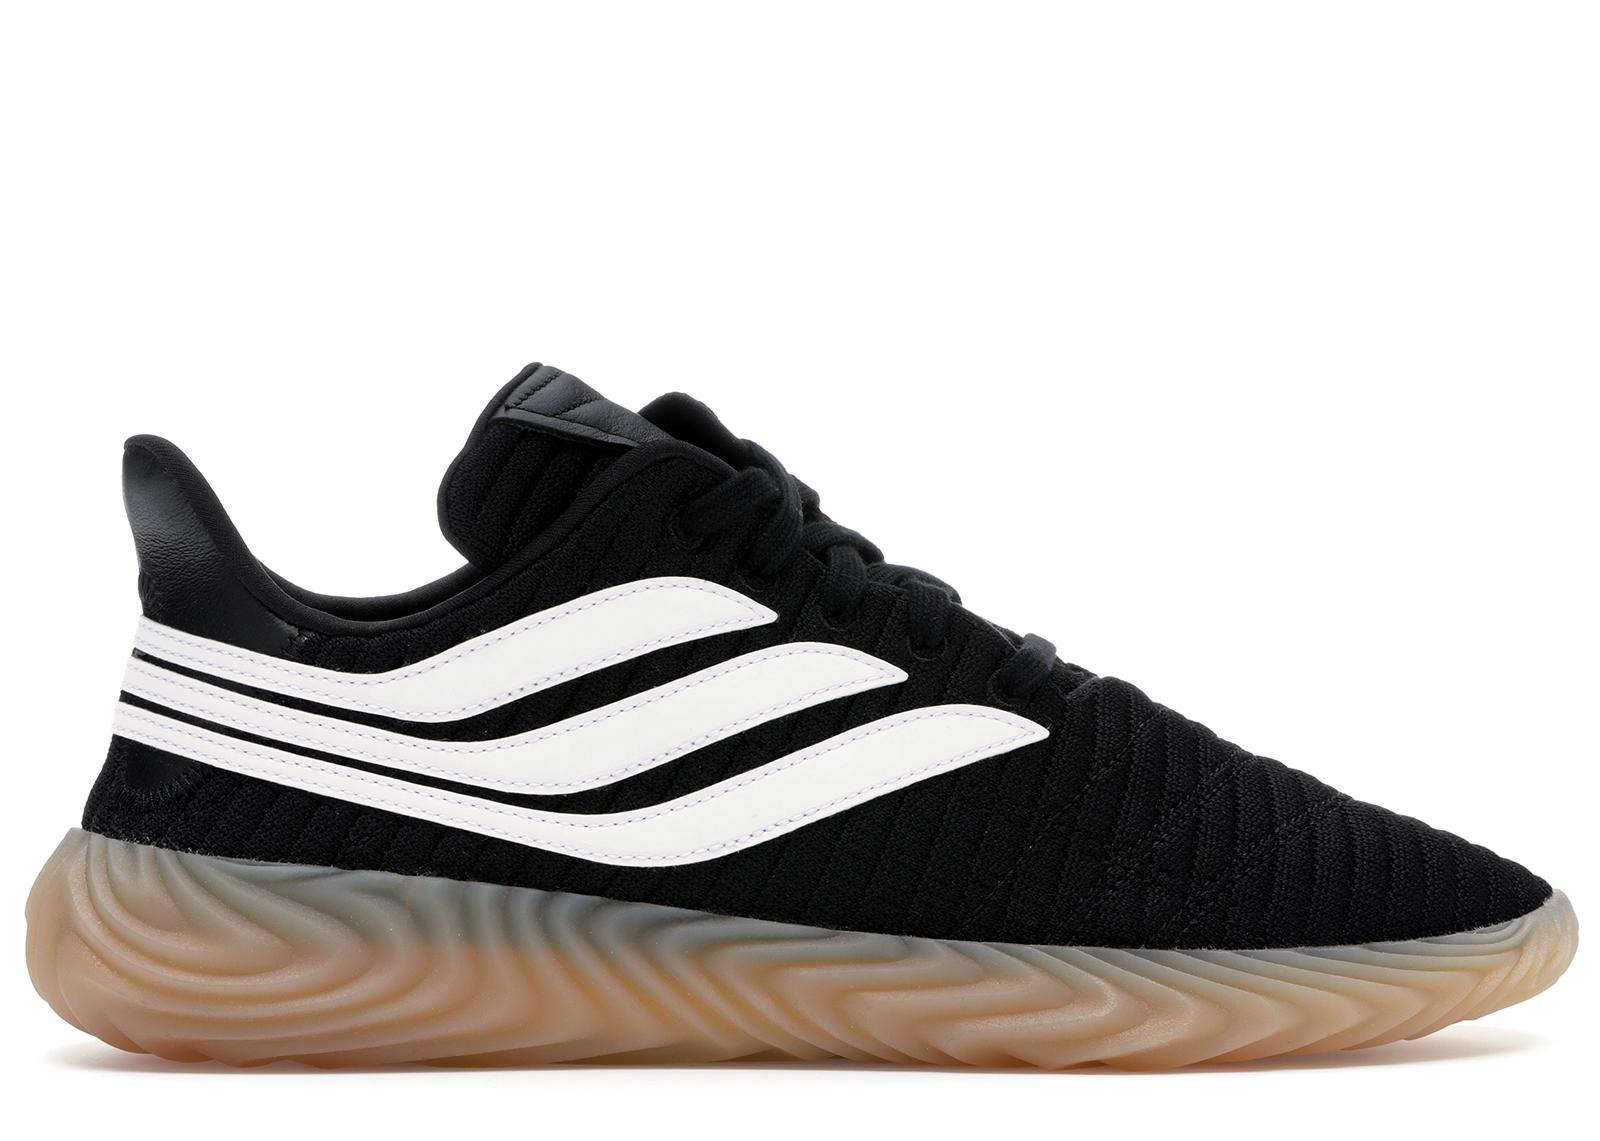 adidas Sobakov Black White Gum - AQ1135